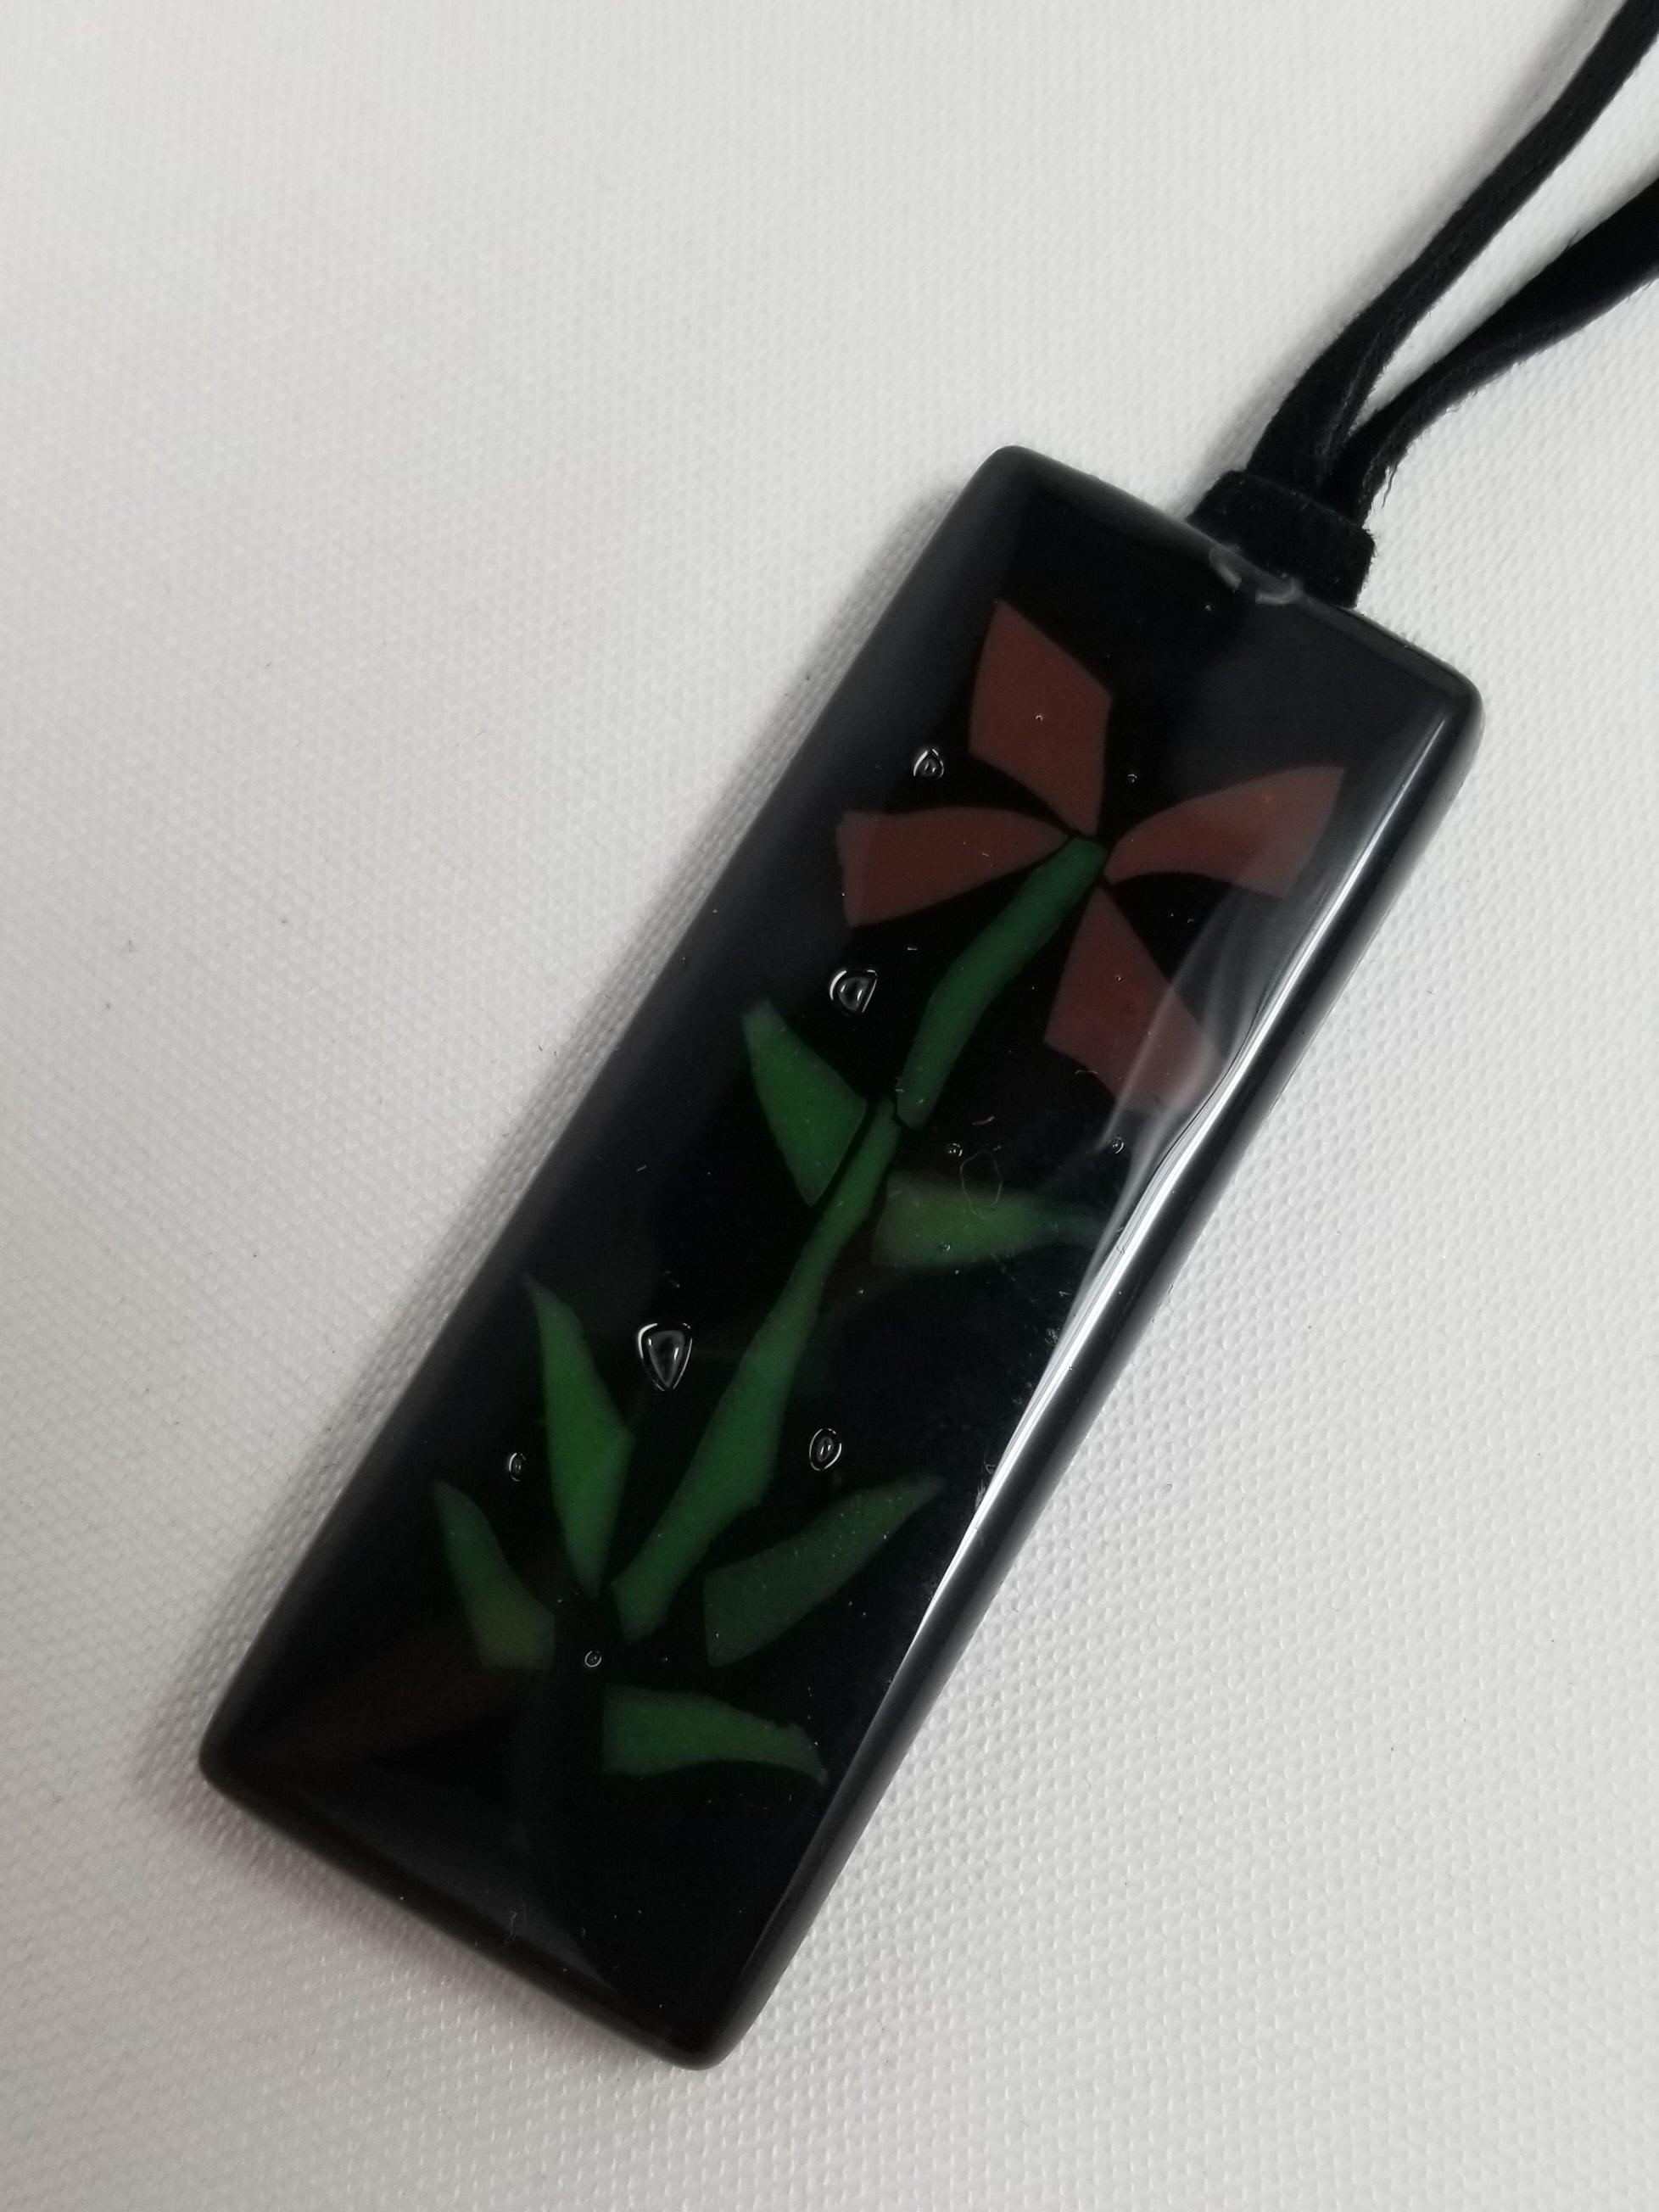 XP 15, 96 cms, 20 grams